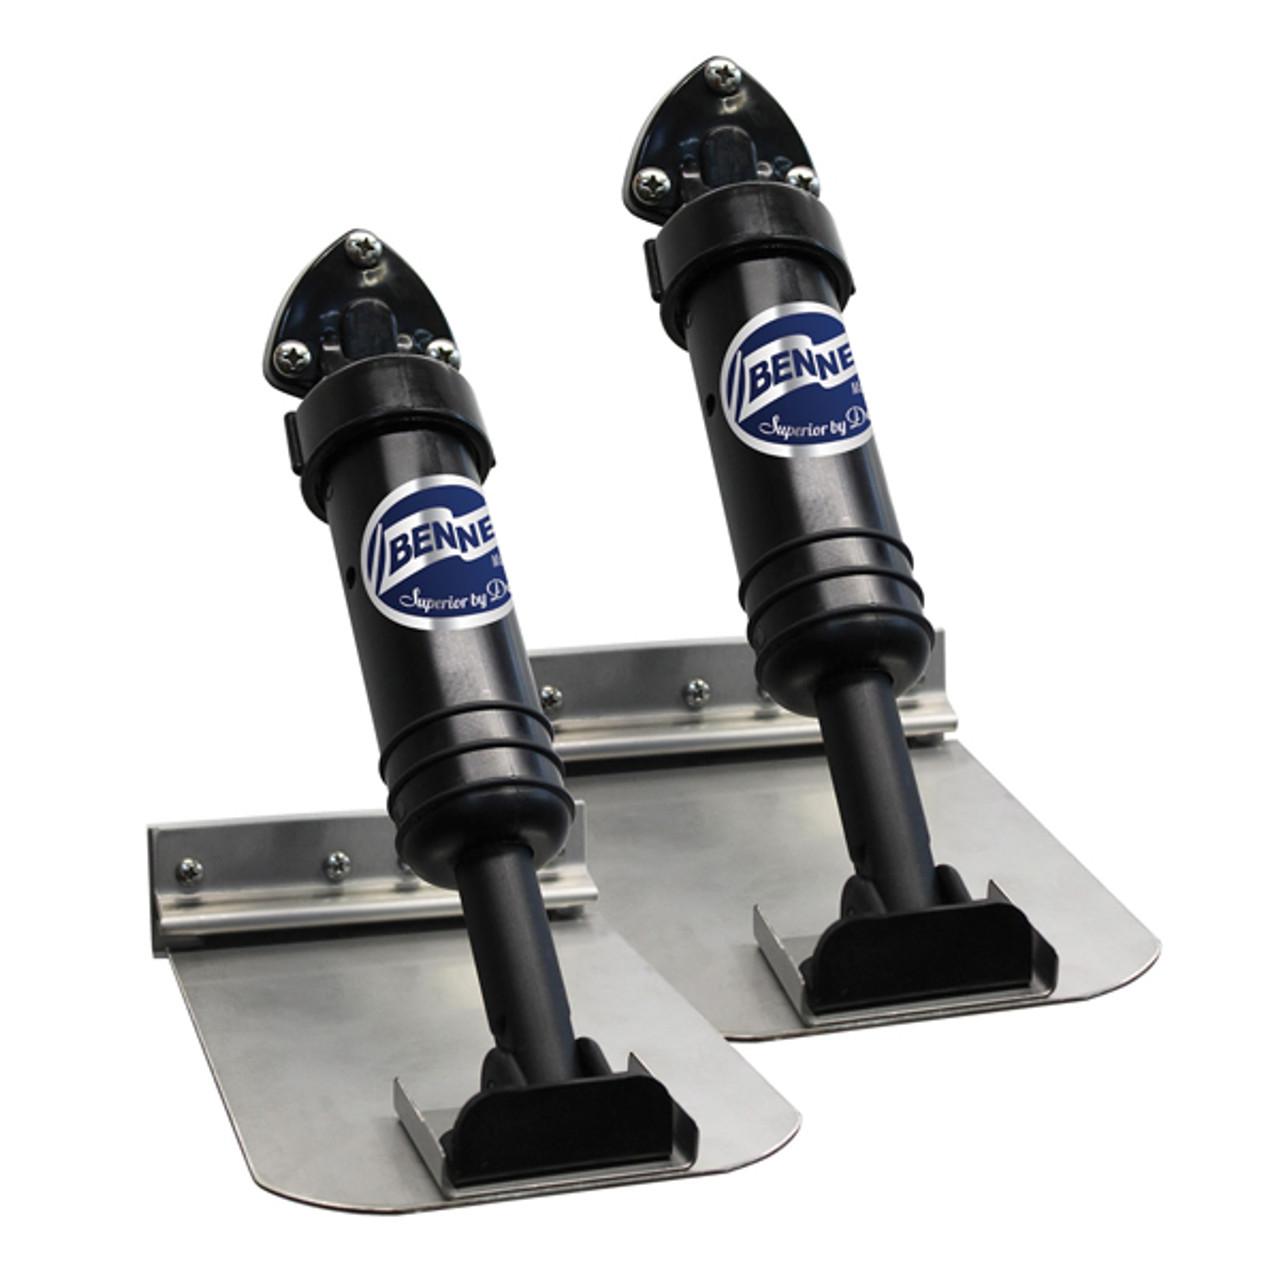 Bennett Trim Tabs Slt6 Self-Leveling Tab System Boats 10/'-14/'